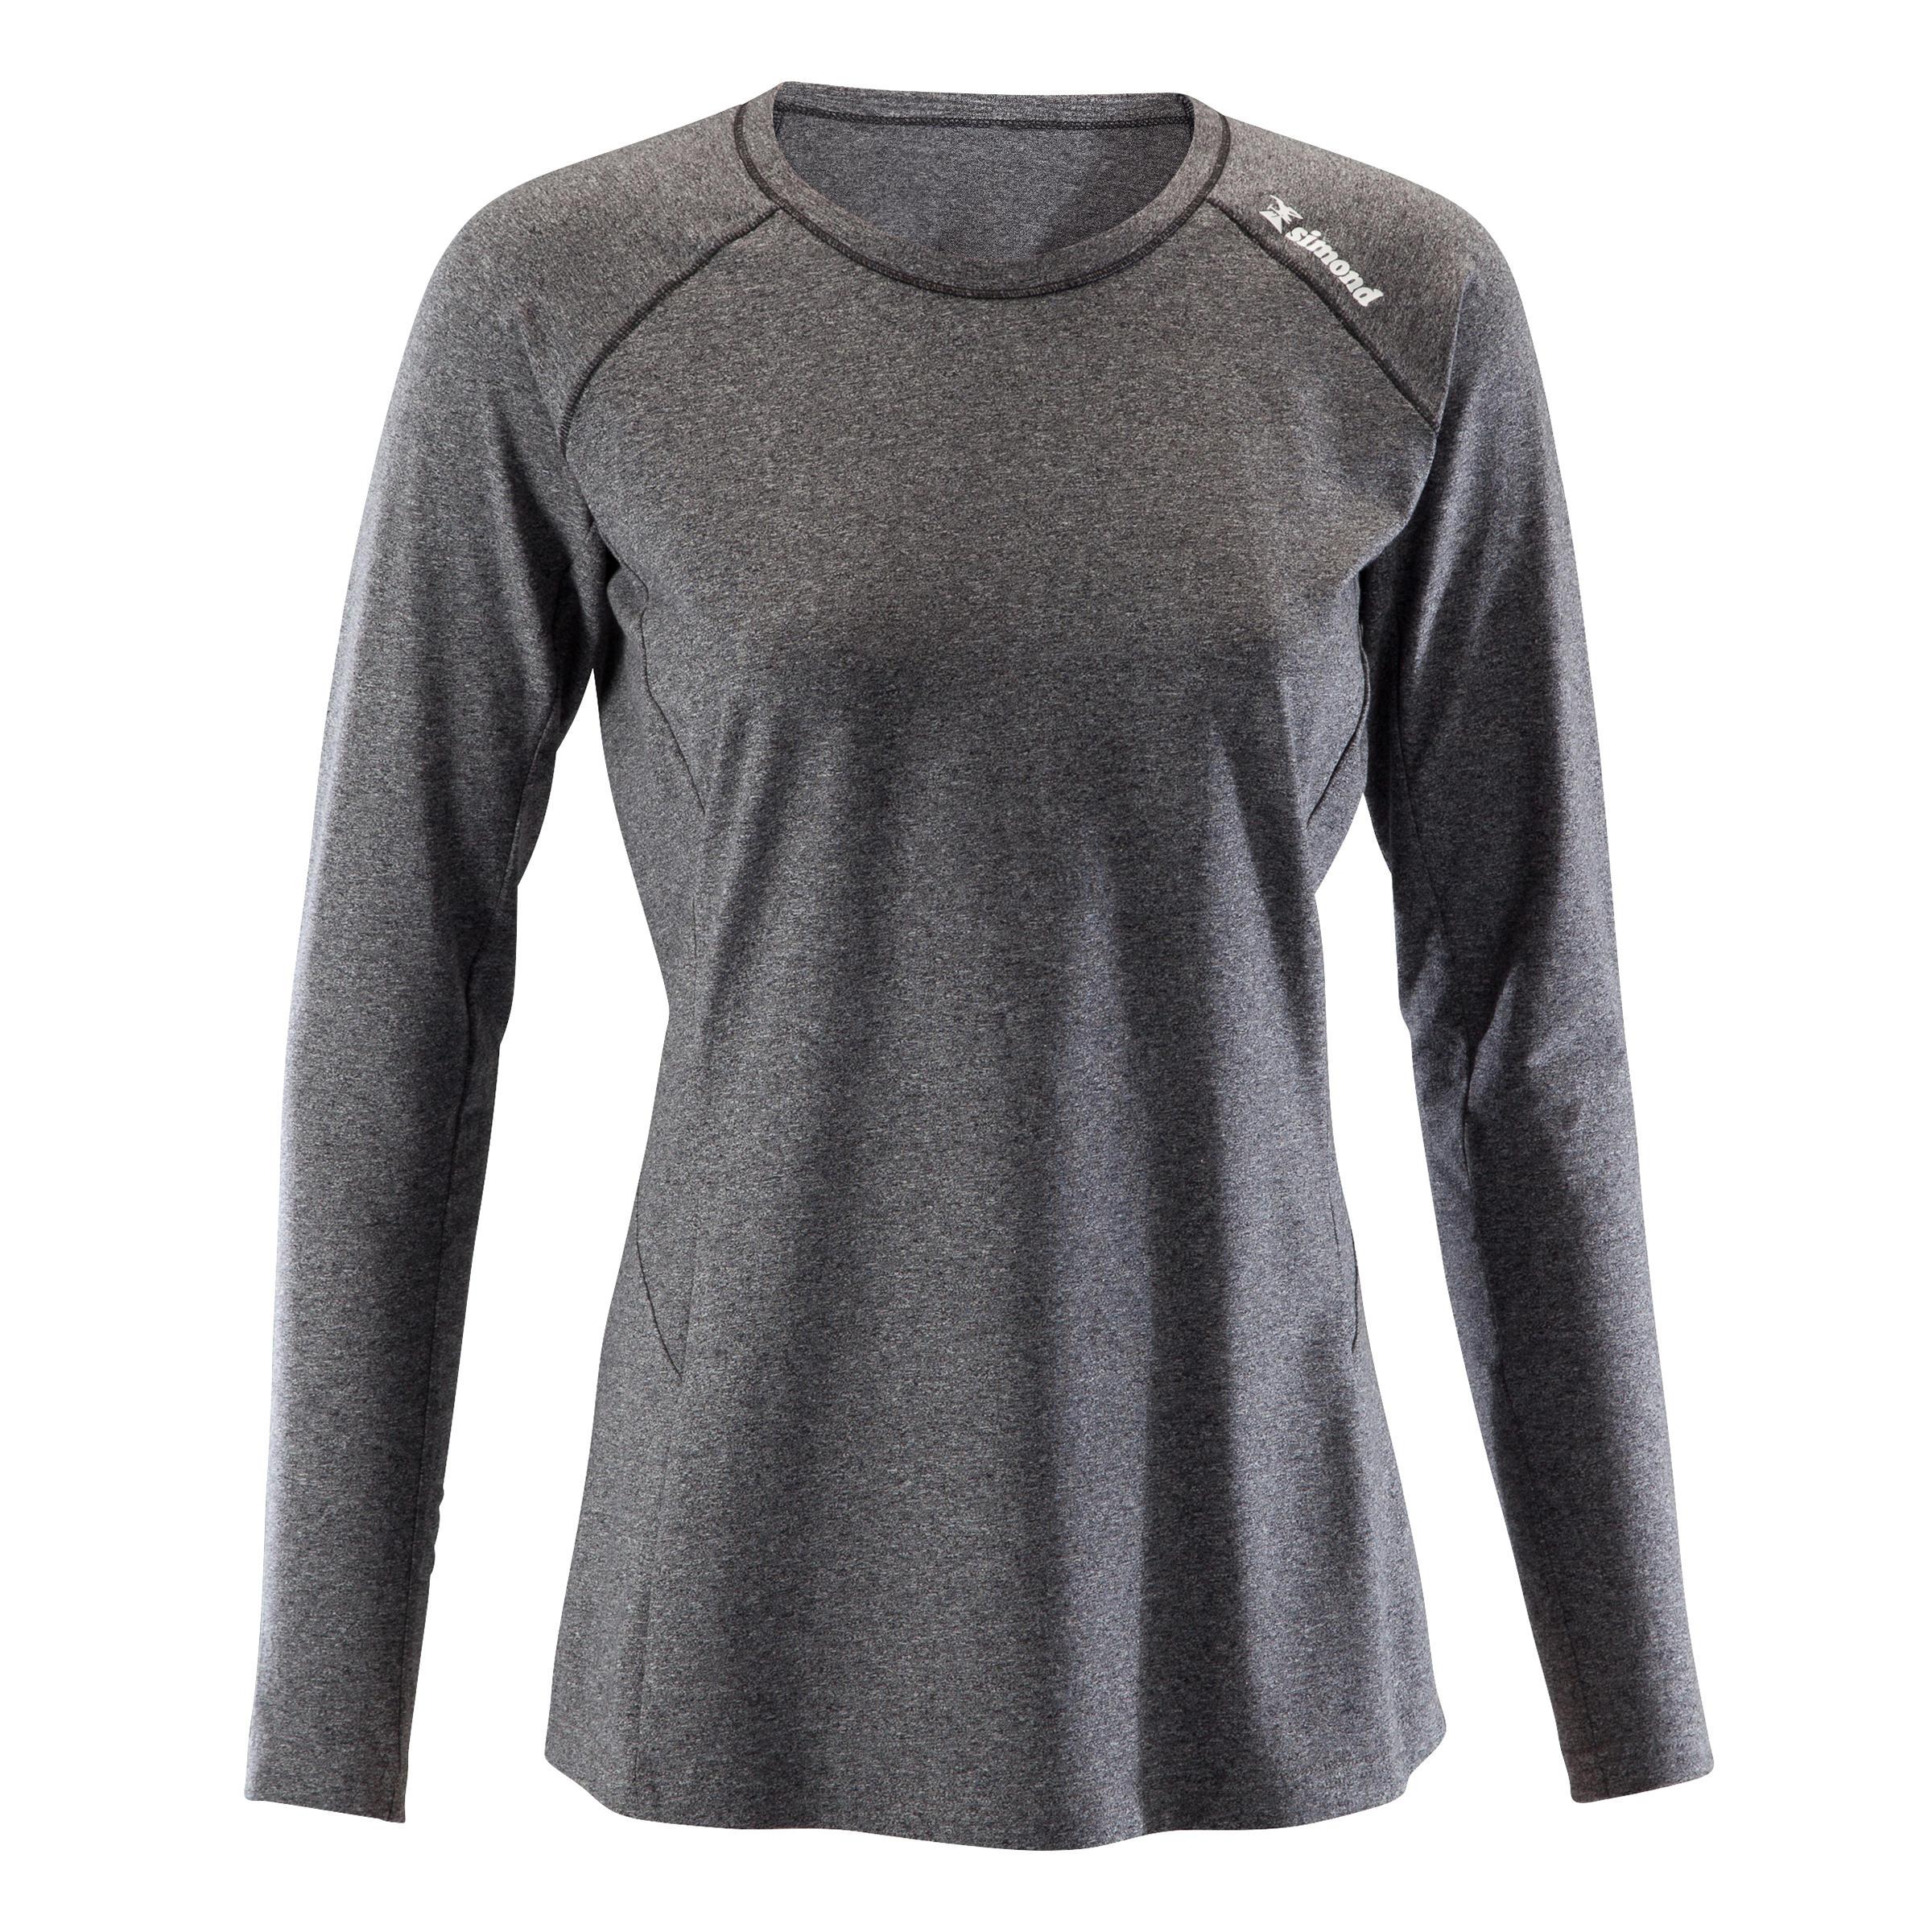 Klettershirt langarm Stretch Damen blaugrau | Sportbekleidung > Sportshirts | Simond